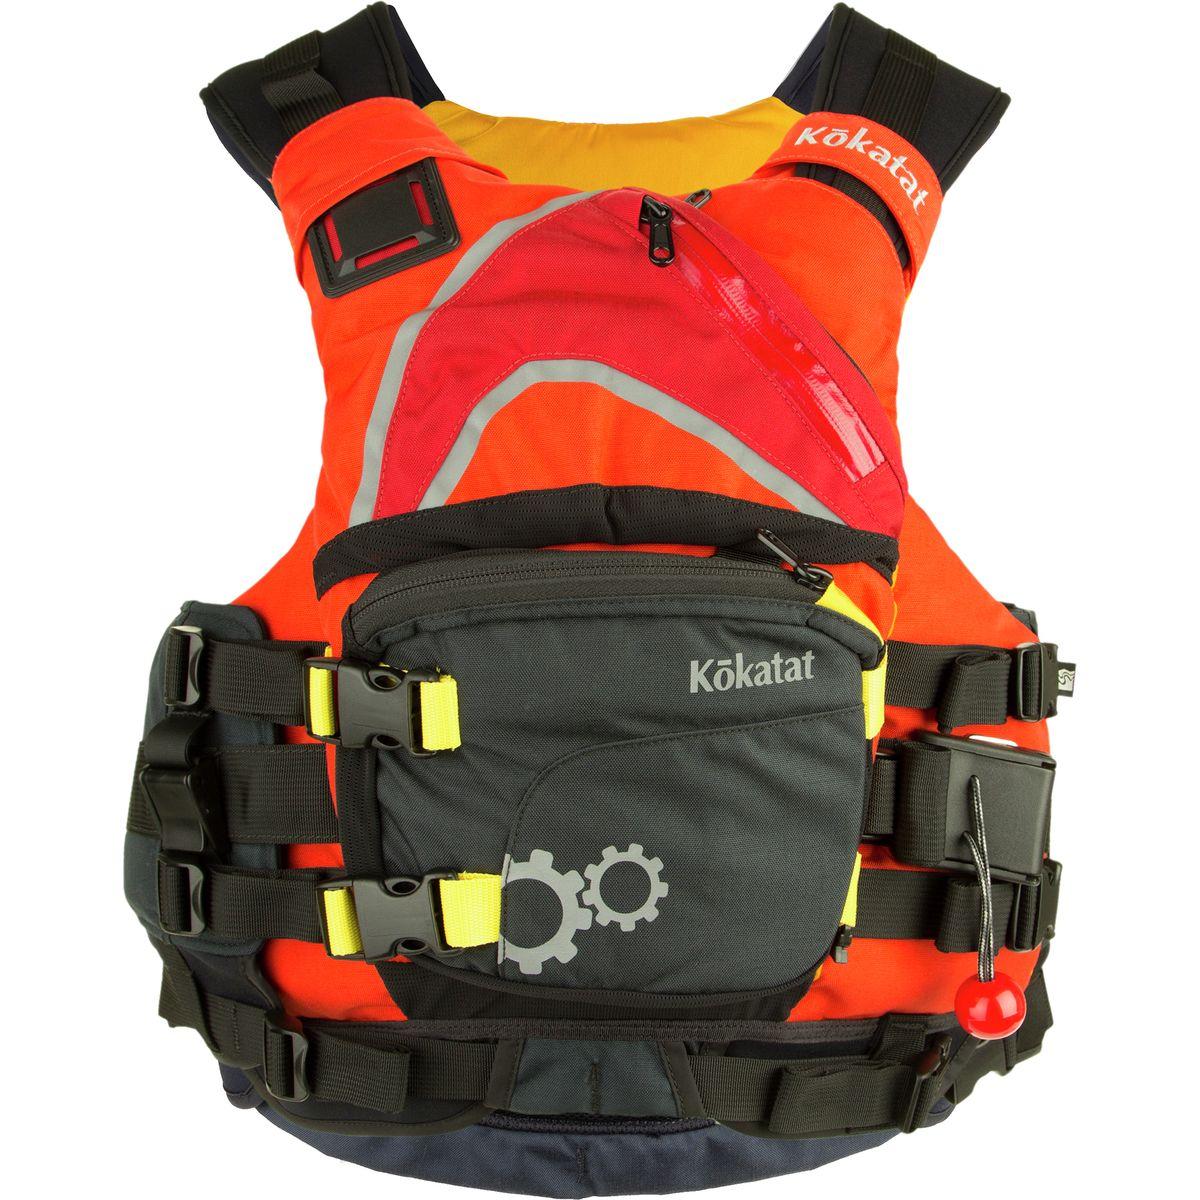 photo: Kokatat Maximus Centurion Rescue PFD life jacket/pfd